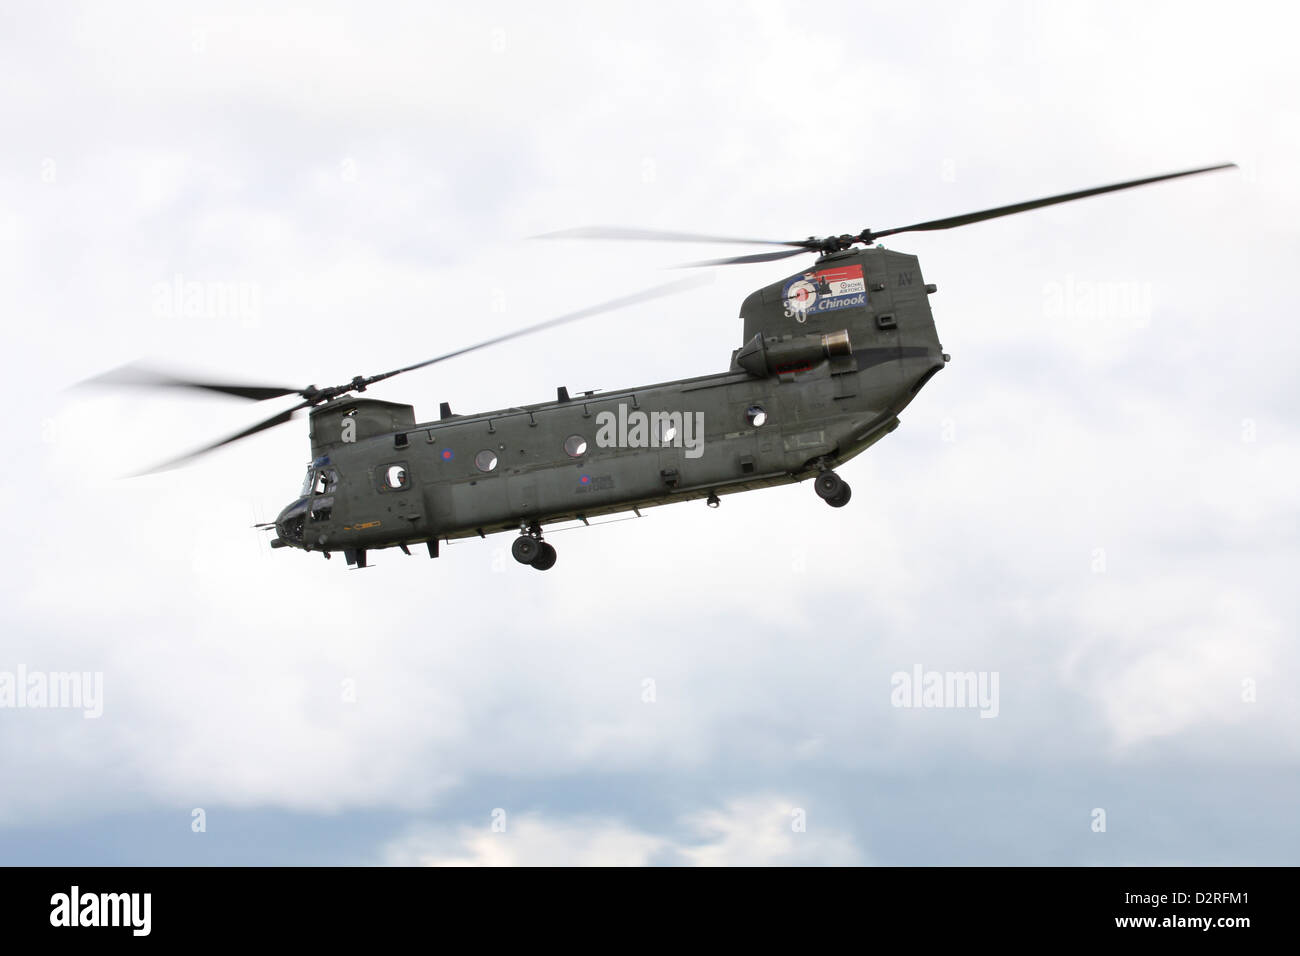 CHinook HC2 ZA714 'AV' displays at RIAT 2012, RAF Fairford - Stock Image